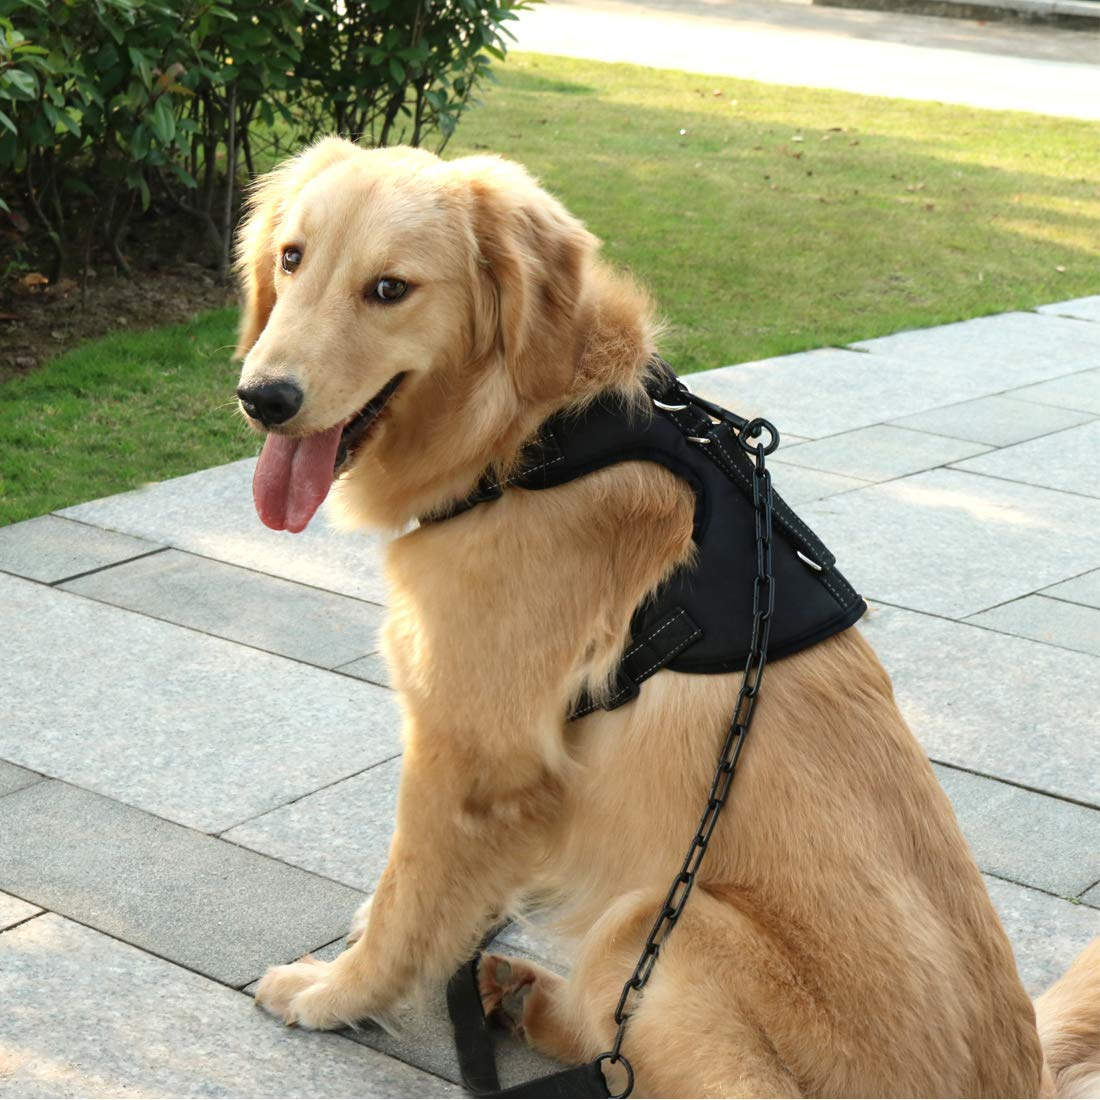 Black Large Black Large SHUNAI No Pull Dog Harness Pet Vest, Walking Dog Harness with Handle, Adjustable & Breathable Design, Great fit for Husky, golden Retriever,Labrador,Belgian Malinois,Border Collie, Size L